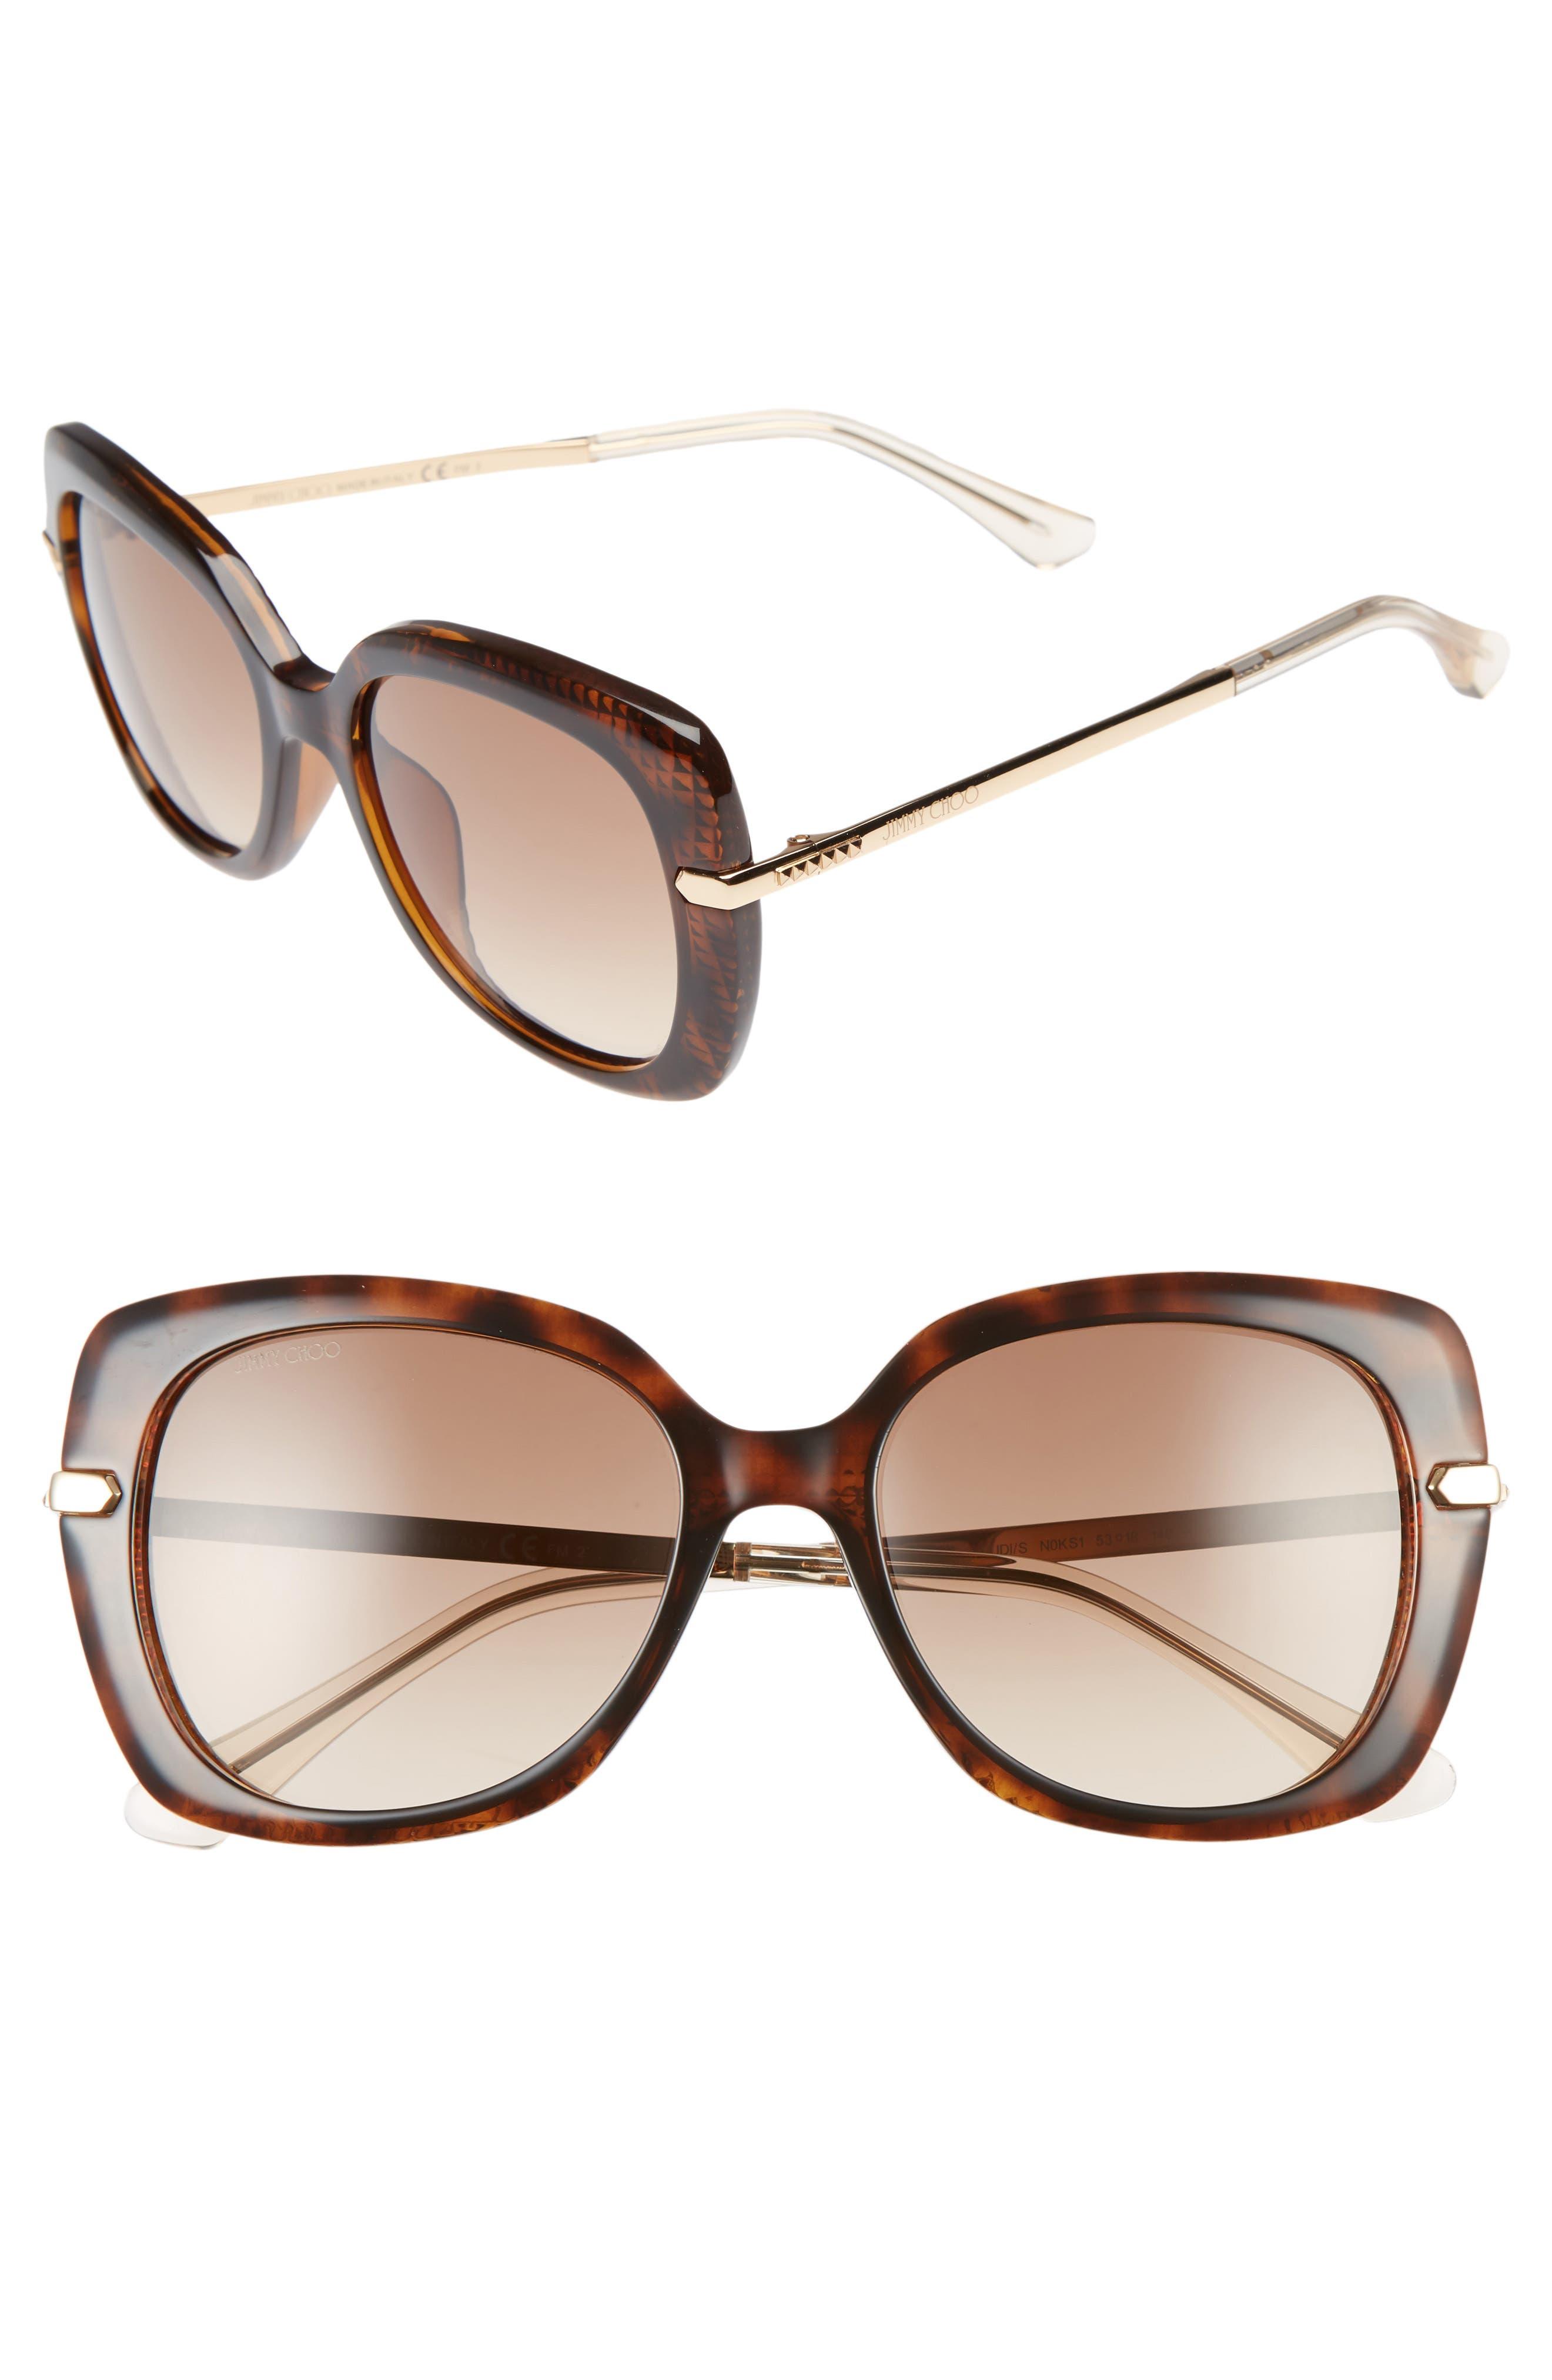 Alternate Image 1 Selected - Jimmy Choo Ludis 53mm Gradient Sunglasses